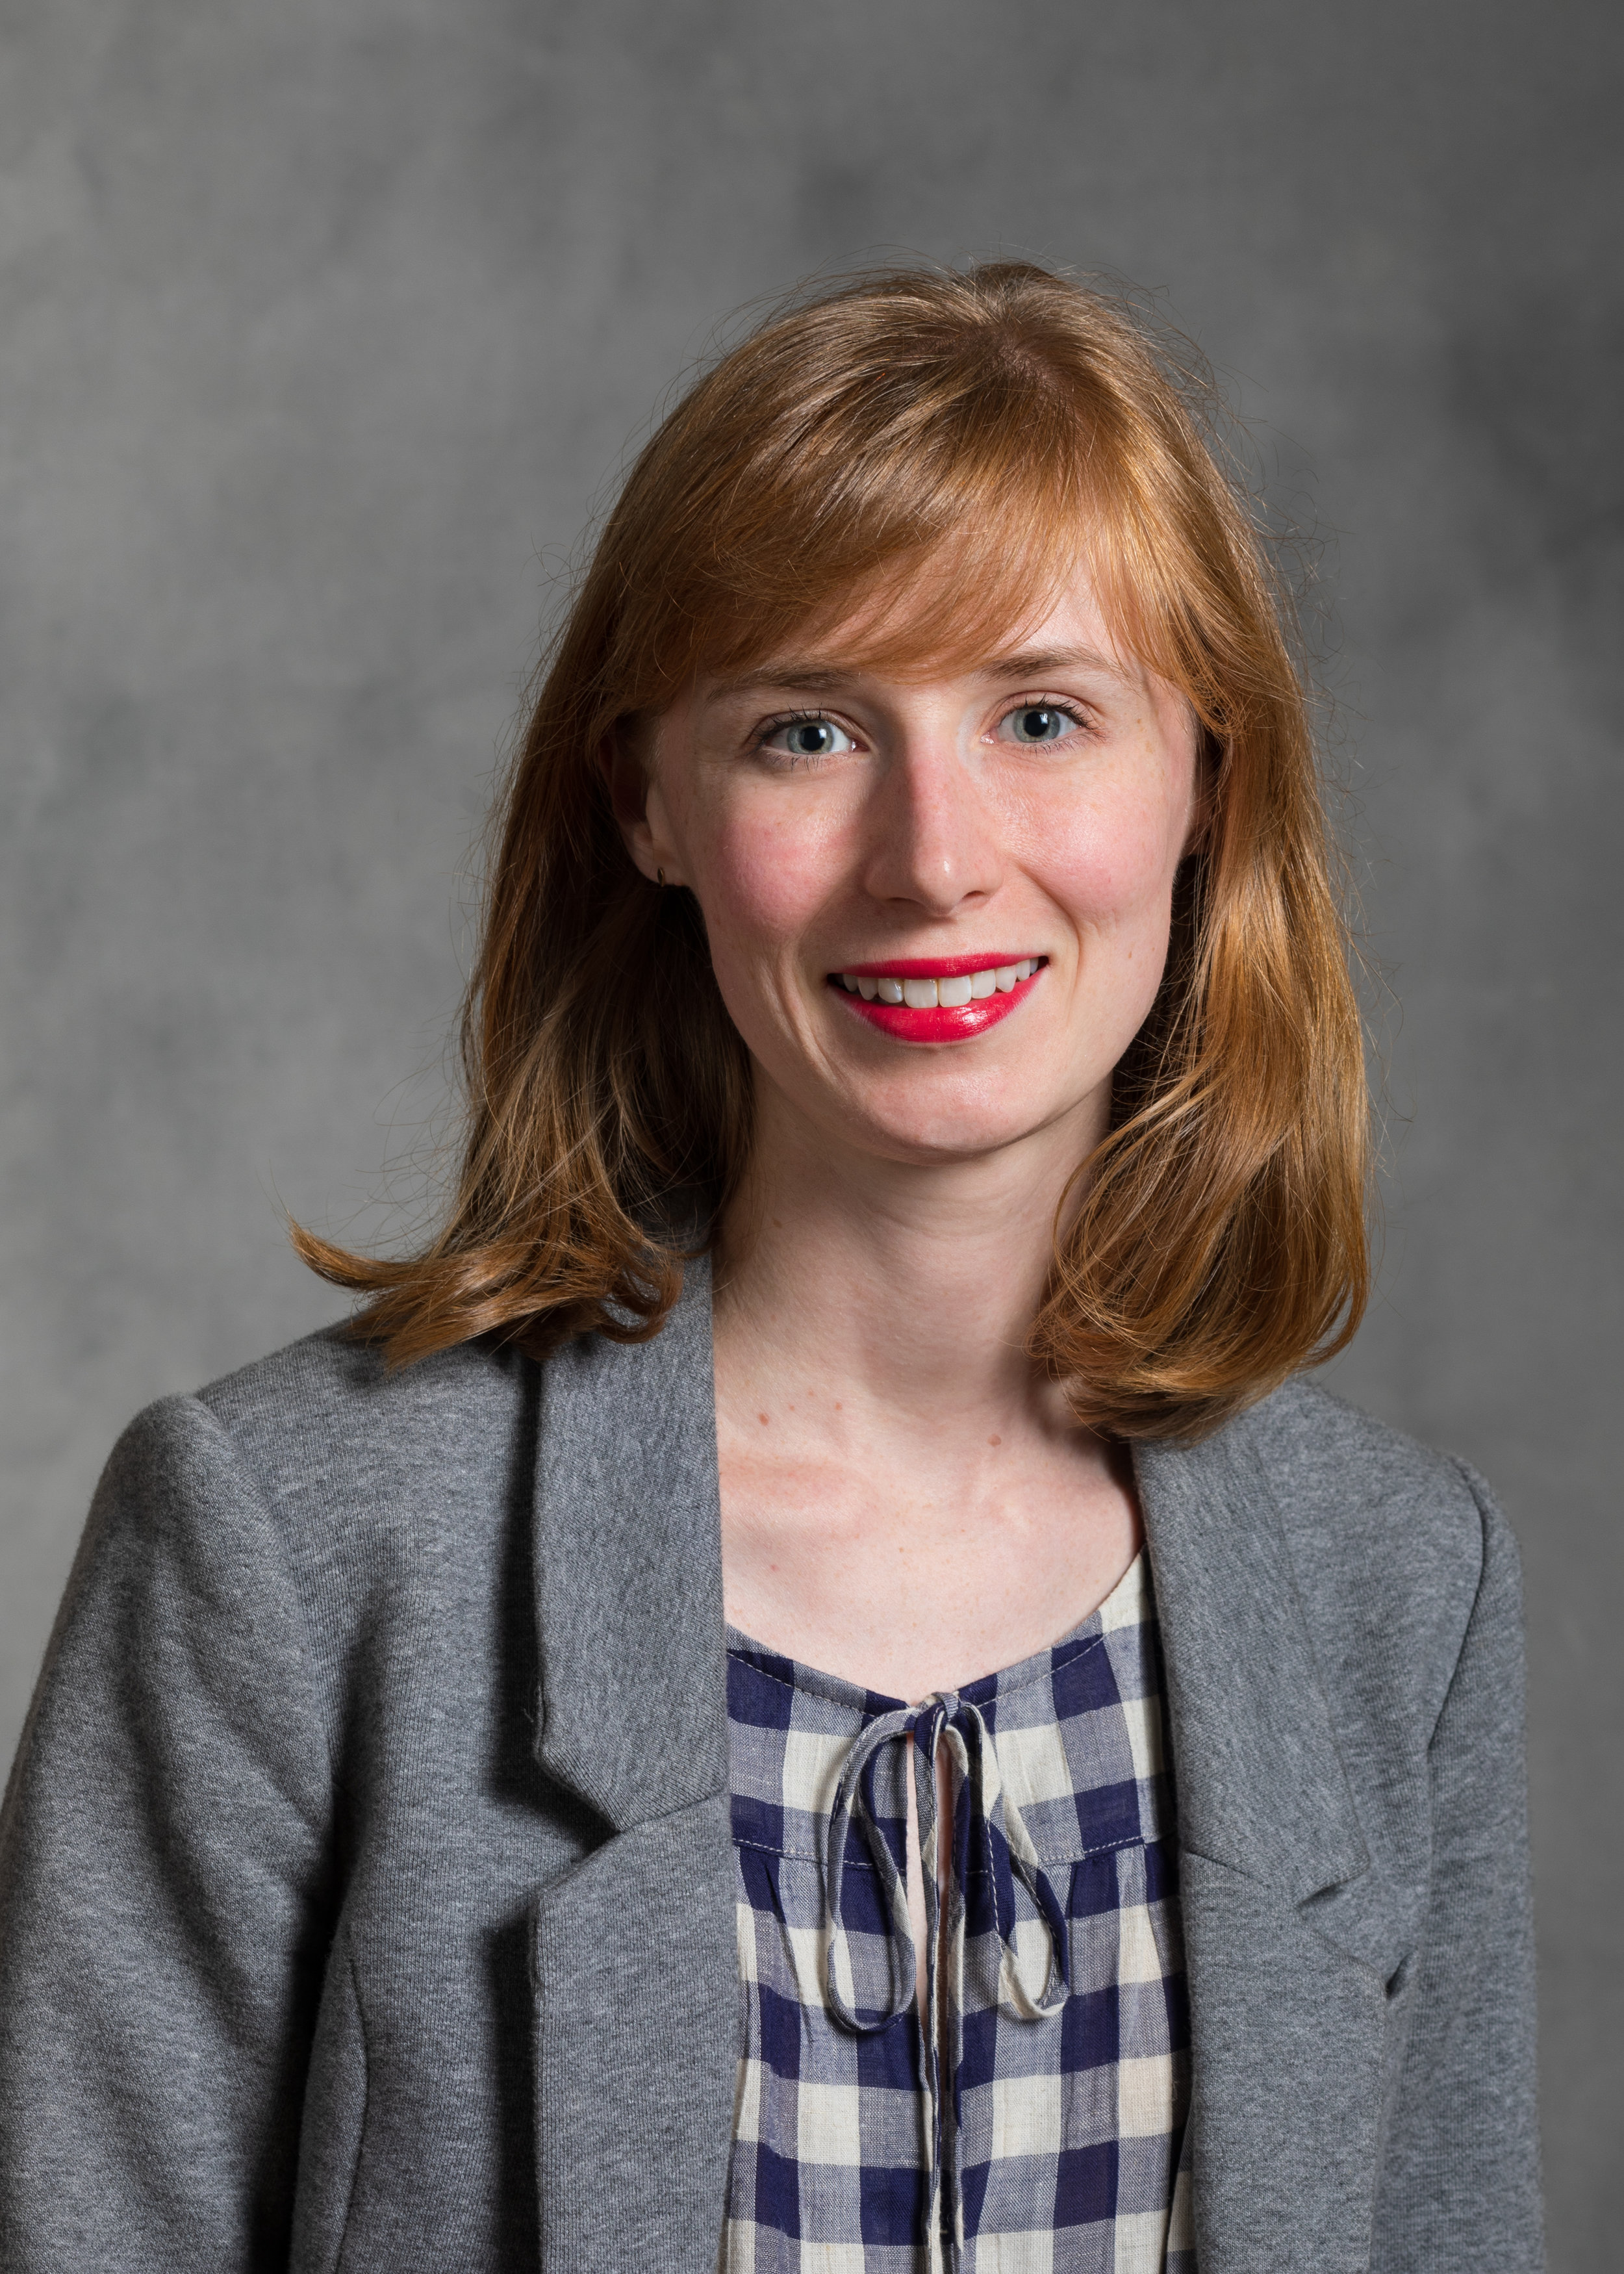 Elizabeth Cardarelli  Program Assistant  (330) 926-2547  ecardarelli@summitlandbank.org